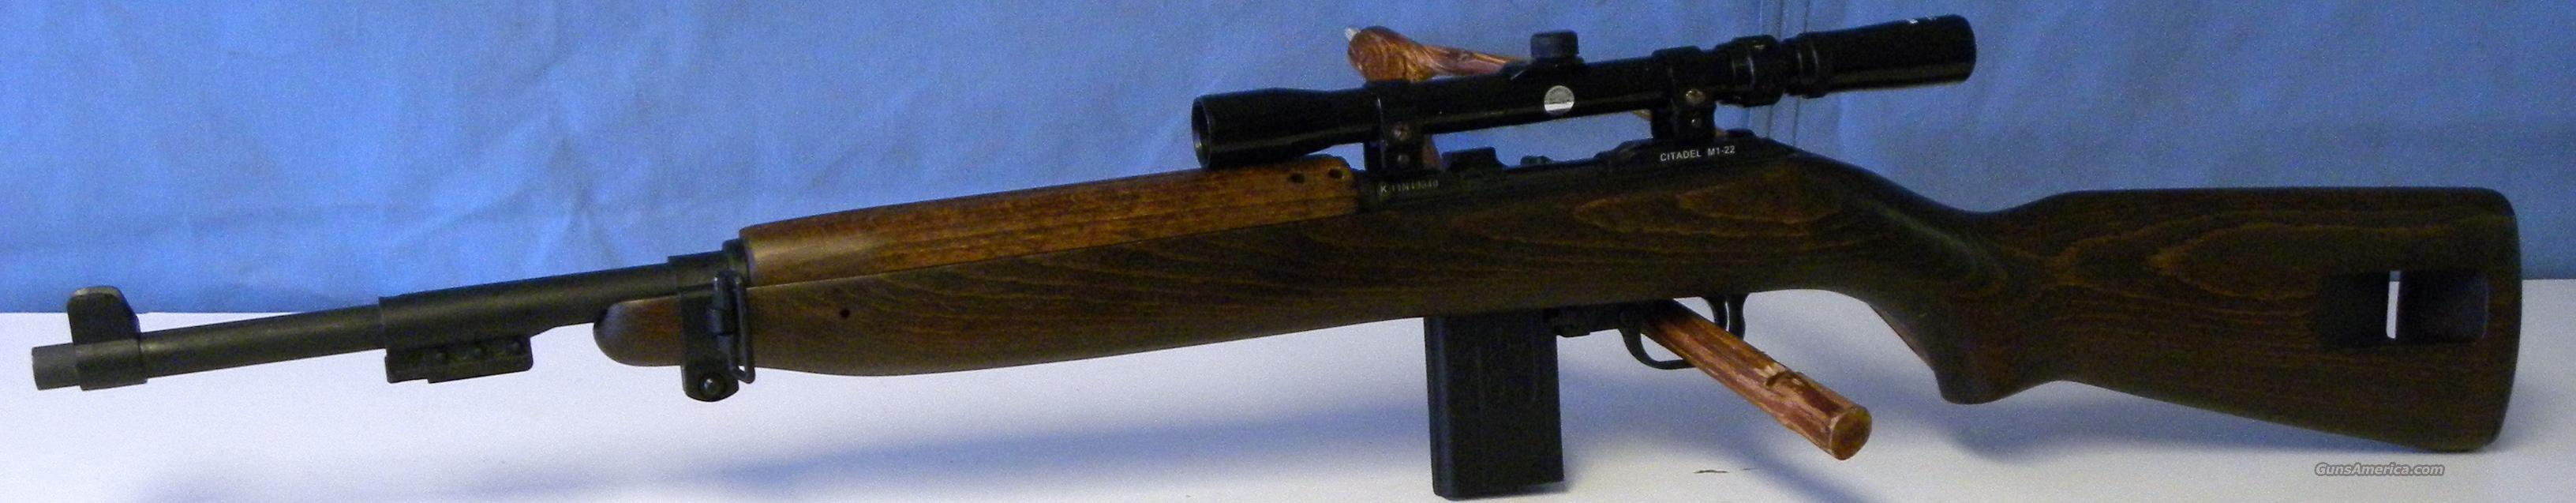 Chiappa M1-22  Guns > Rifles > Chiappa / Armi Sport Rifles > .22 Cal Rifles